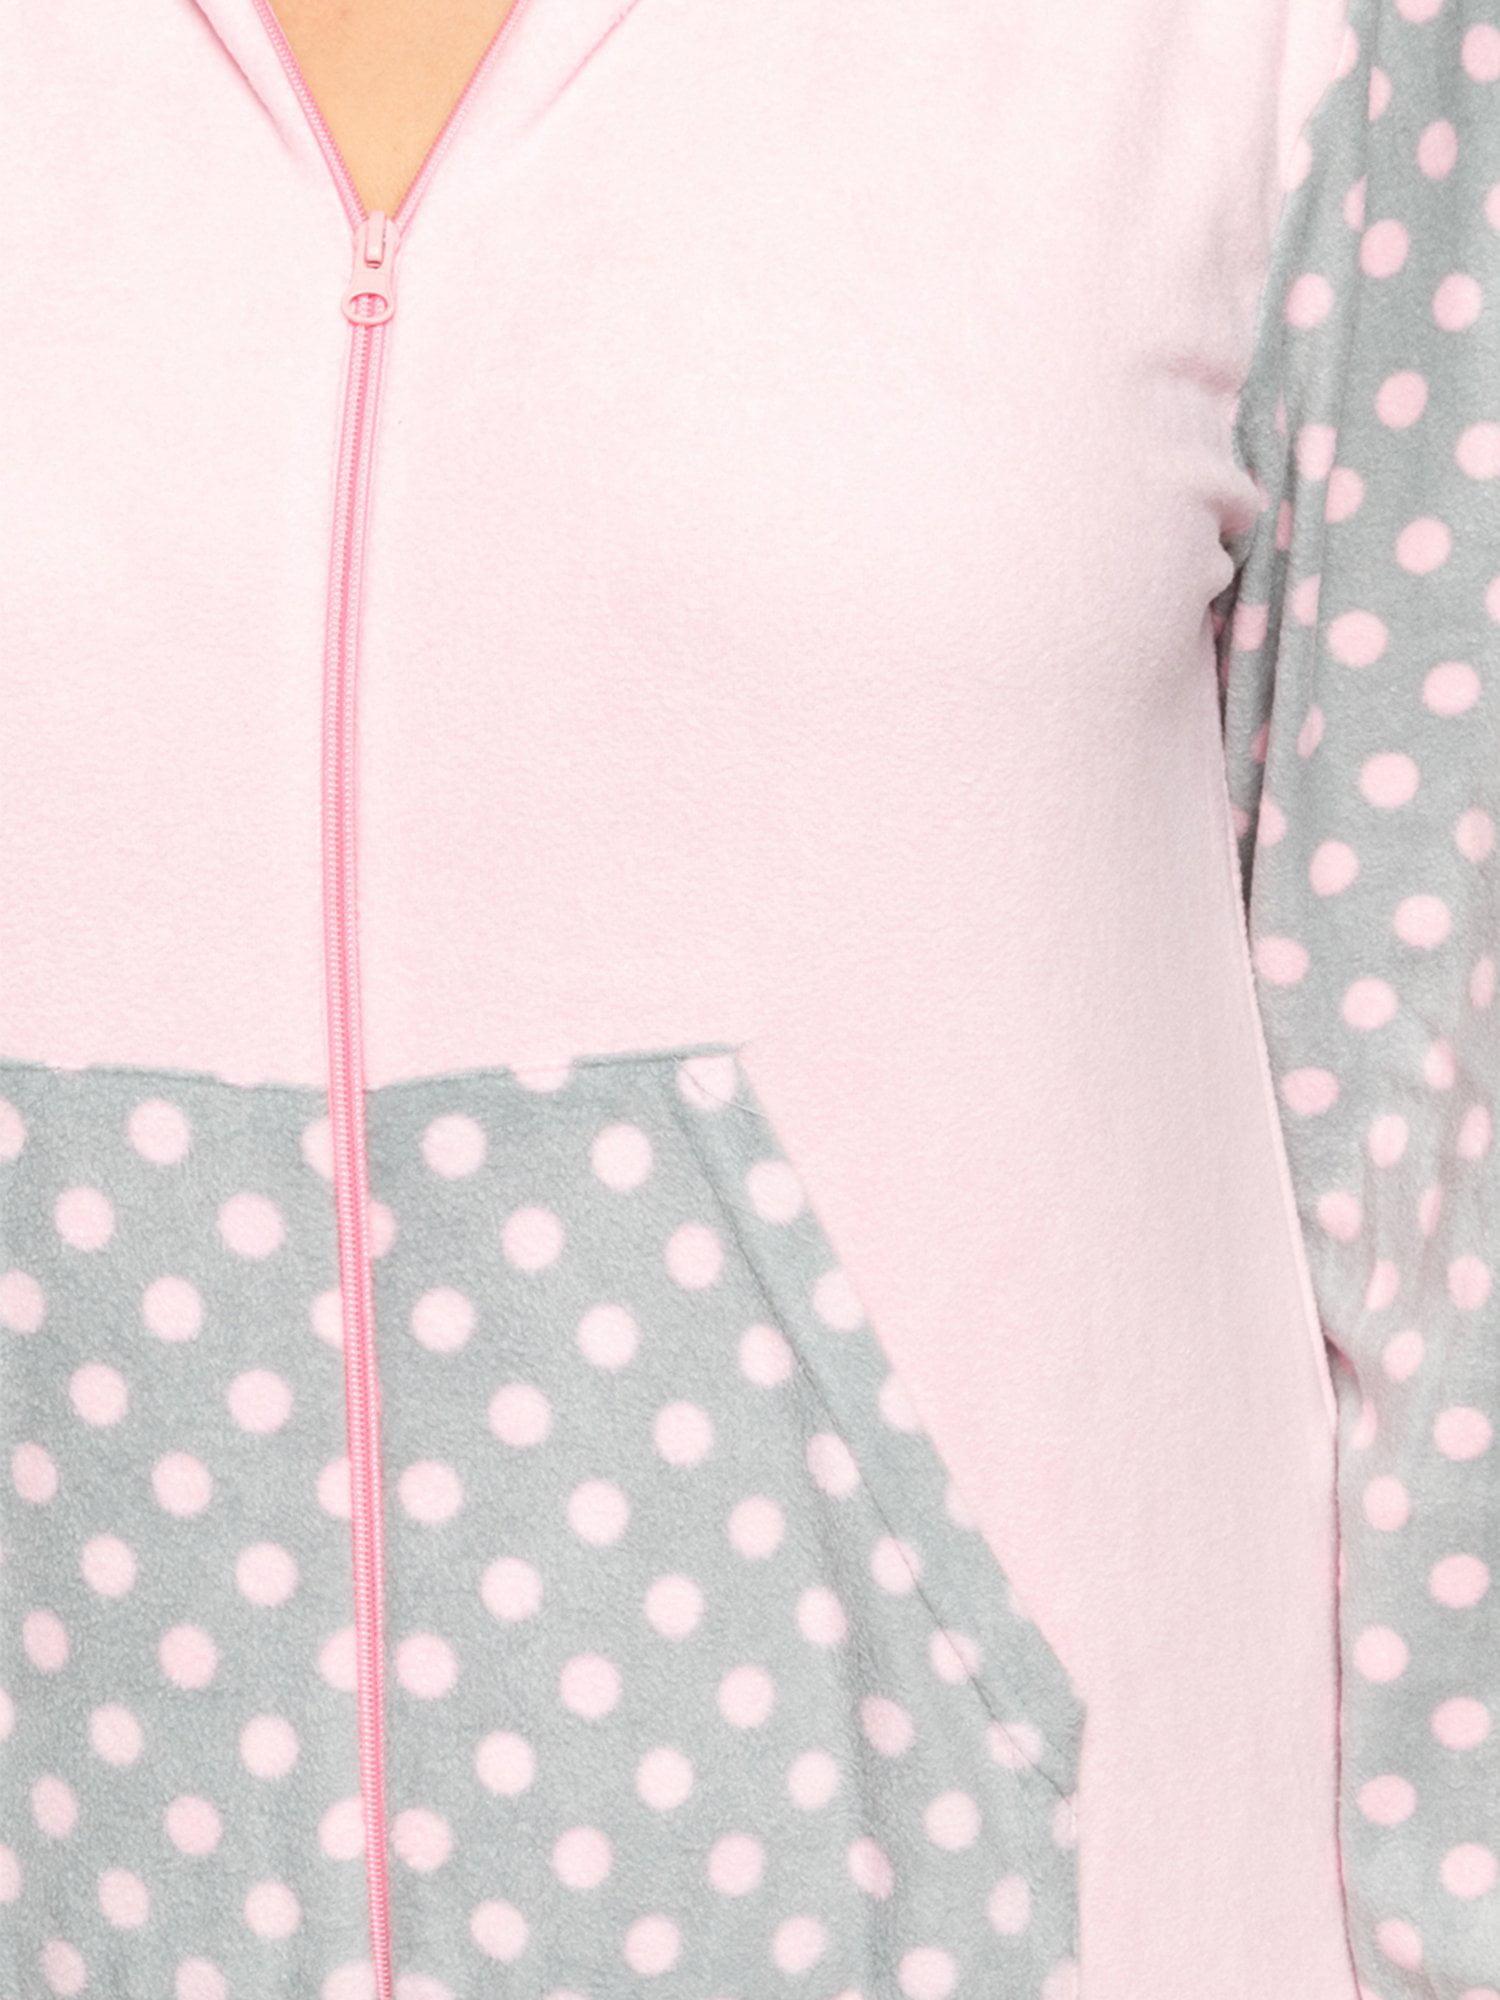 d42a7850d5 Xehar - Xehar Women s Plus Size Soft Plush Warm Comfy Nightwear Loungewear  Pajama Pjs Cow Onesie - Walmart.com